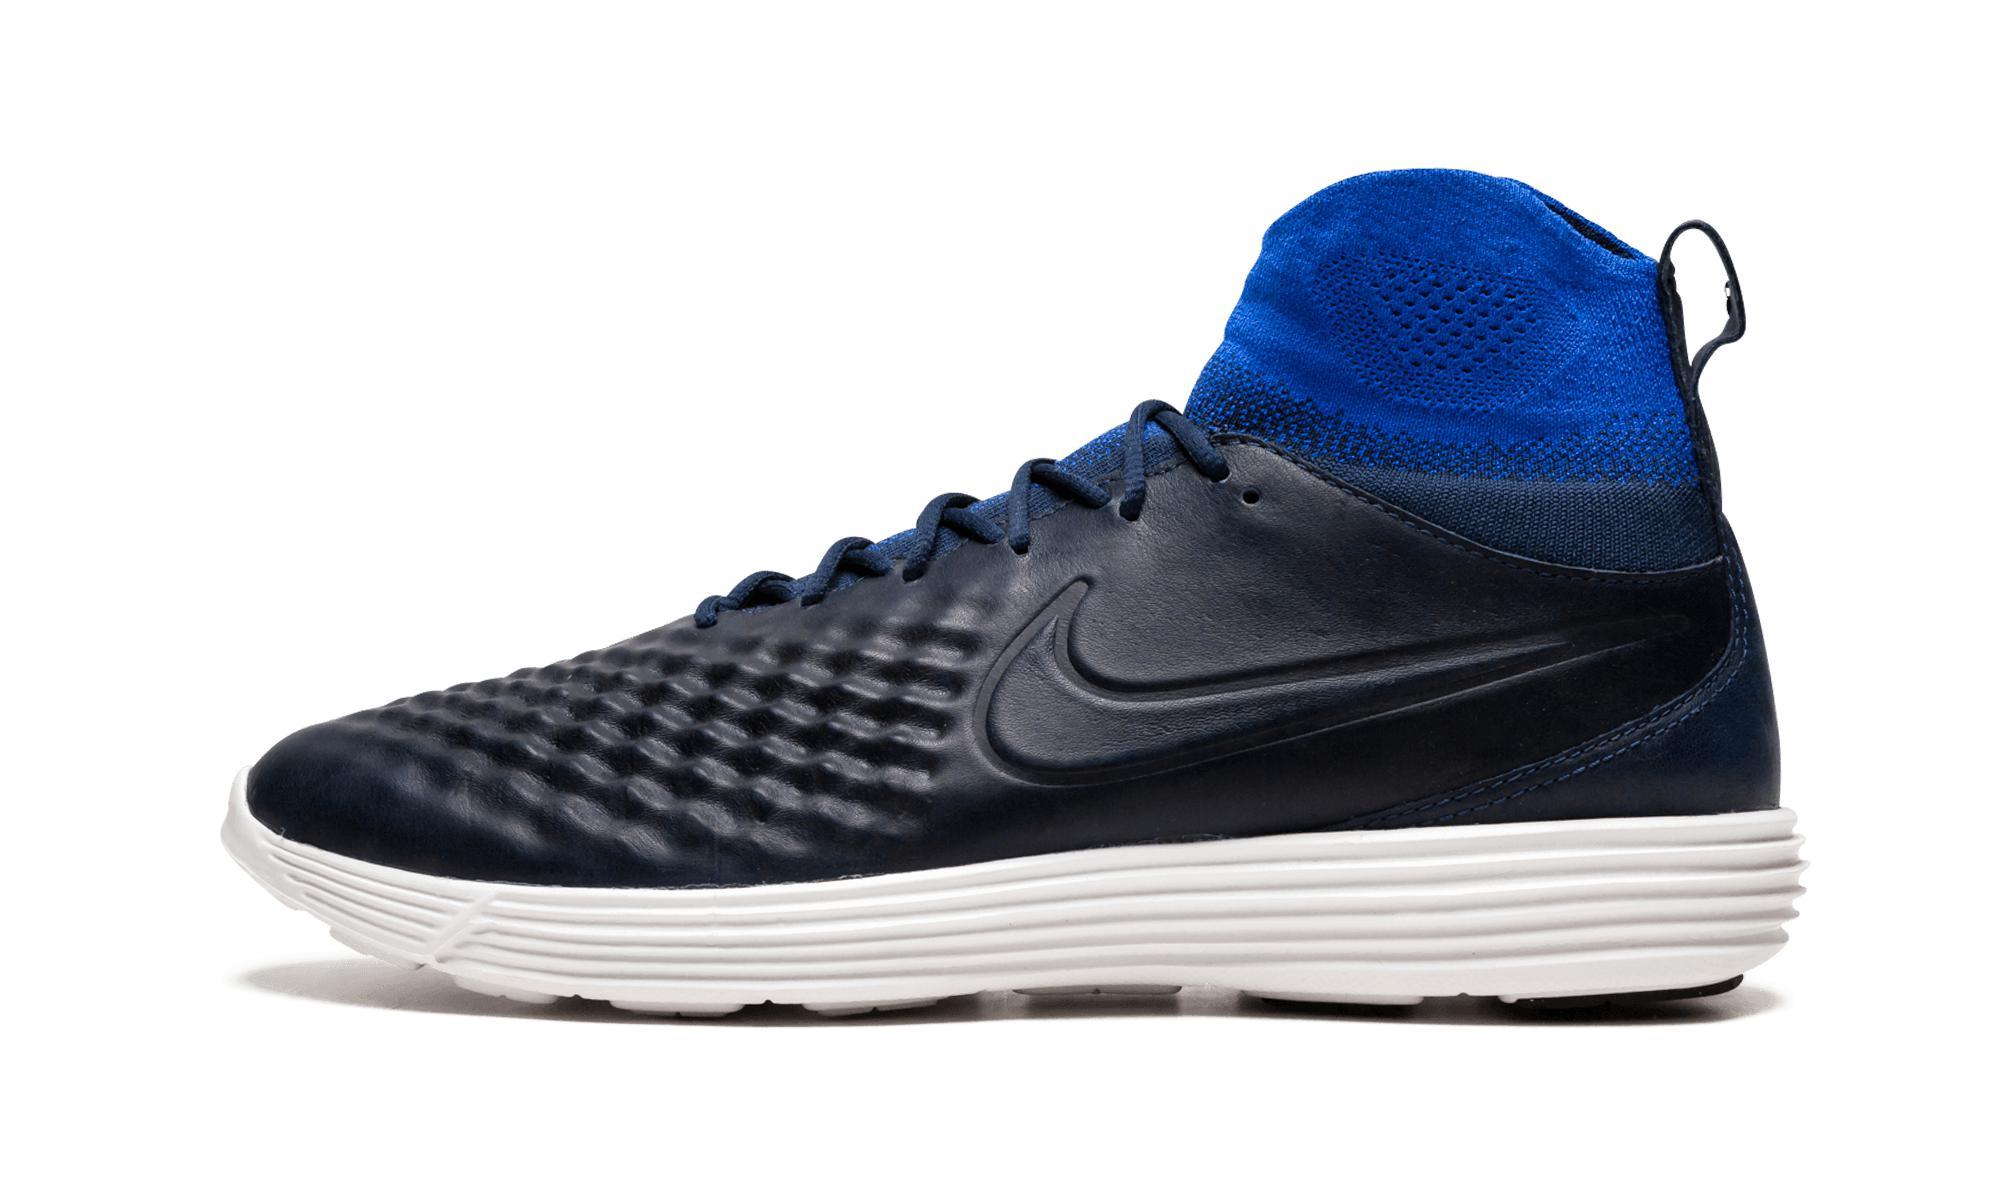 311291a1abfc2 Nike Lunar Magista 2 Fk in Blue for Men - Save 22% - Lyst